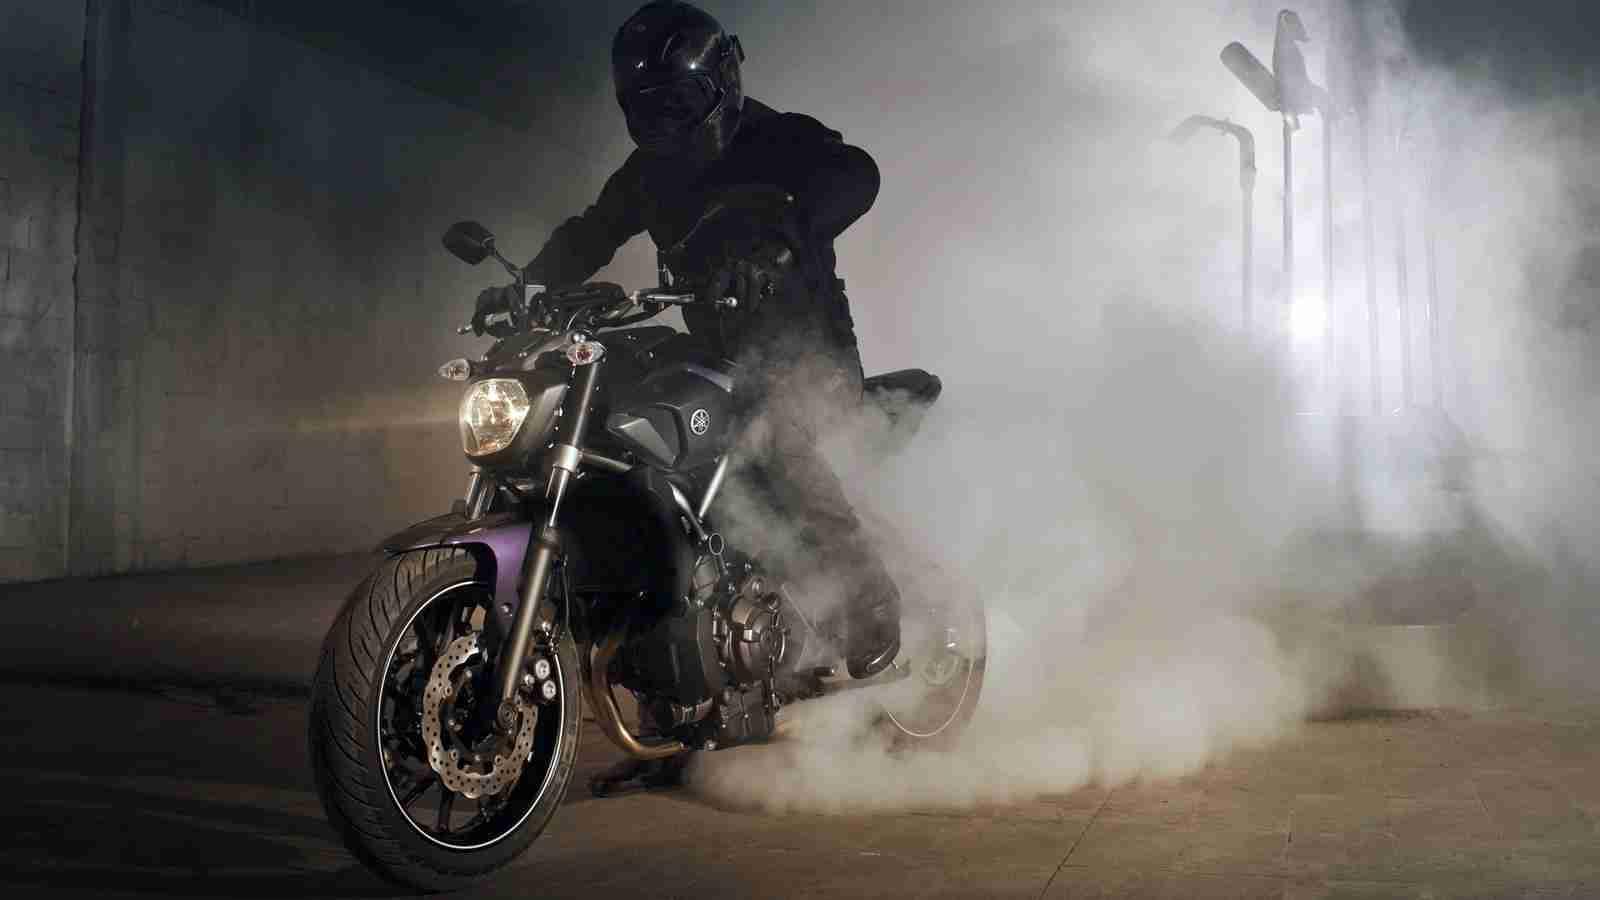 2014 Yamaha MT-07 - 03